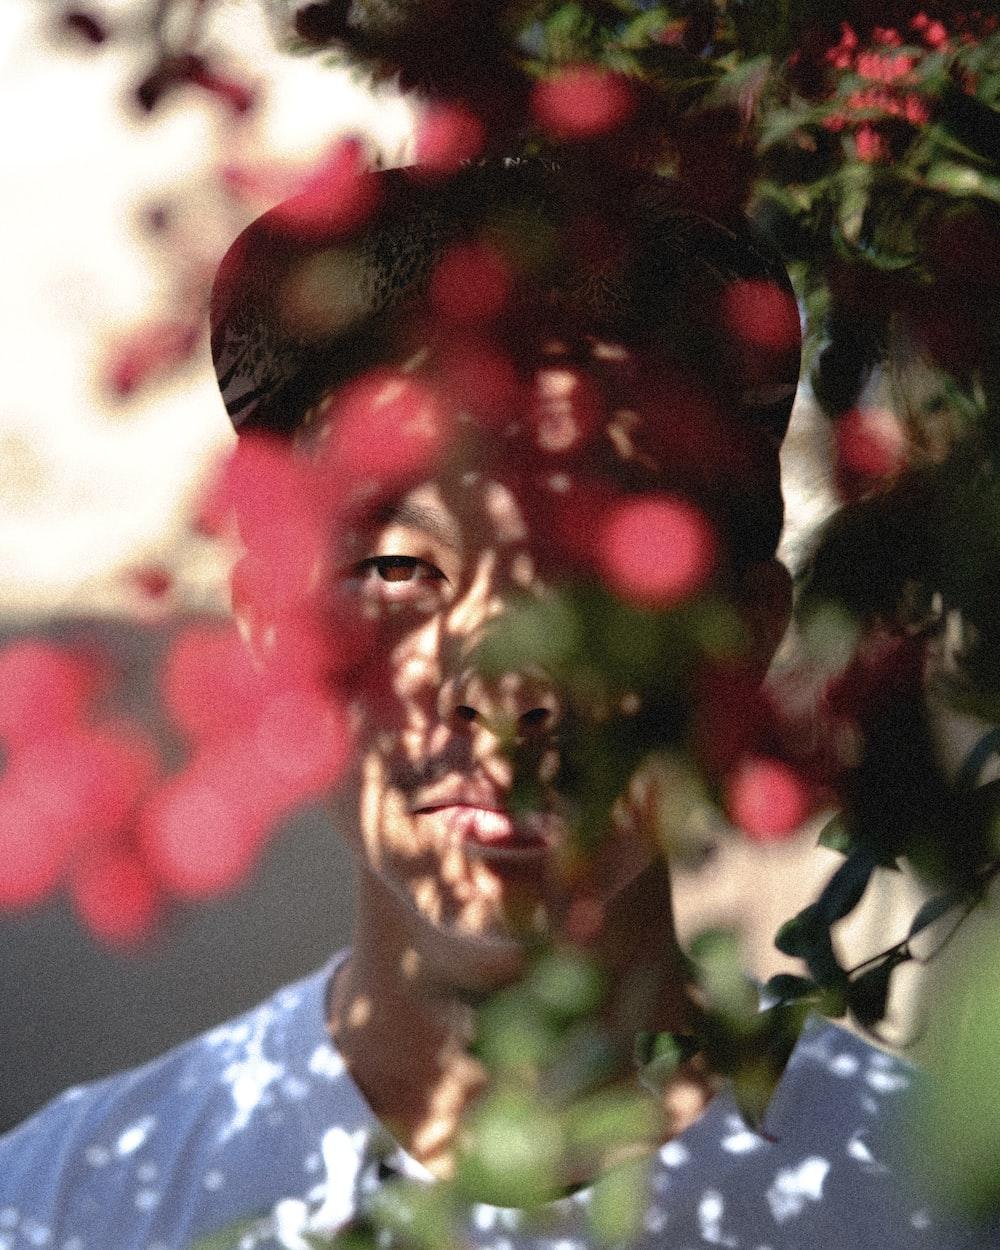 man in white crew-neck shirt posing near flowers